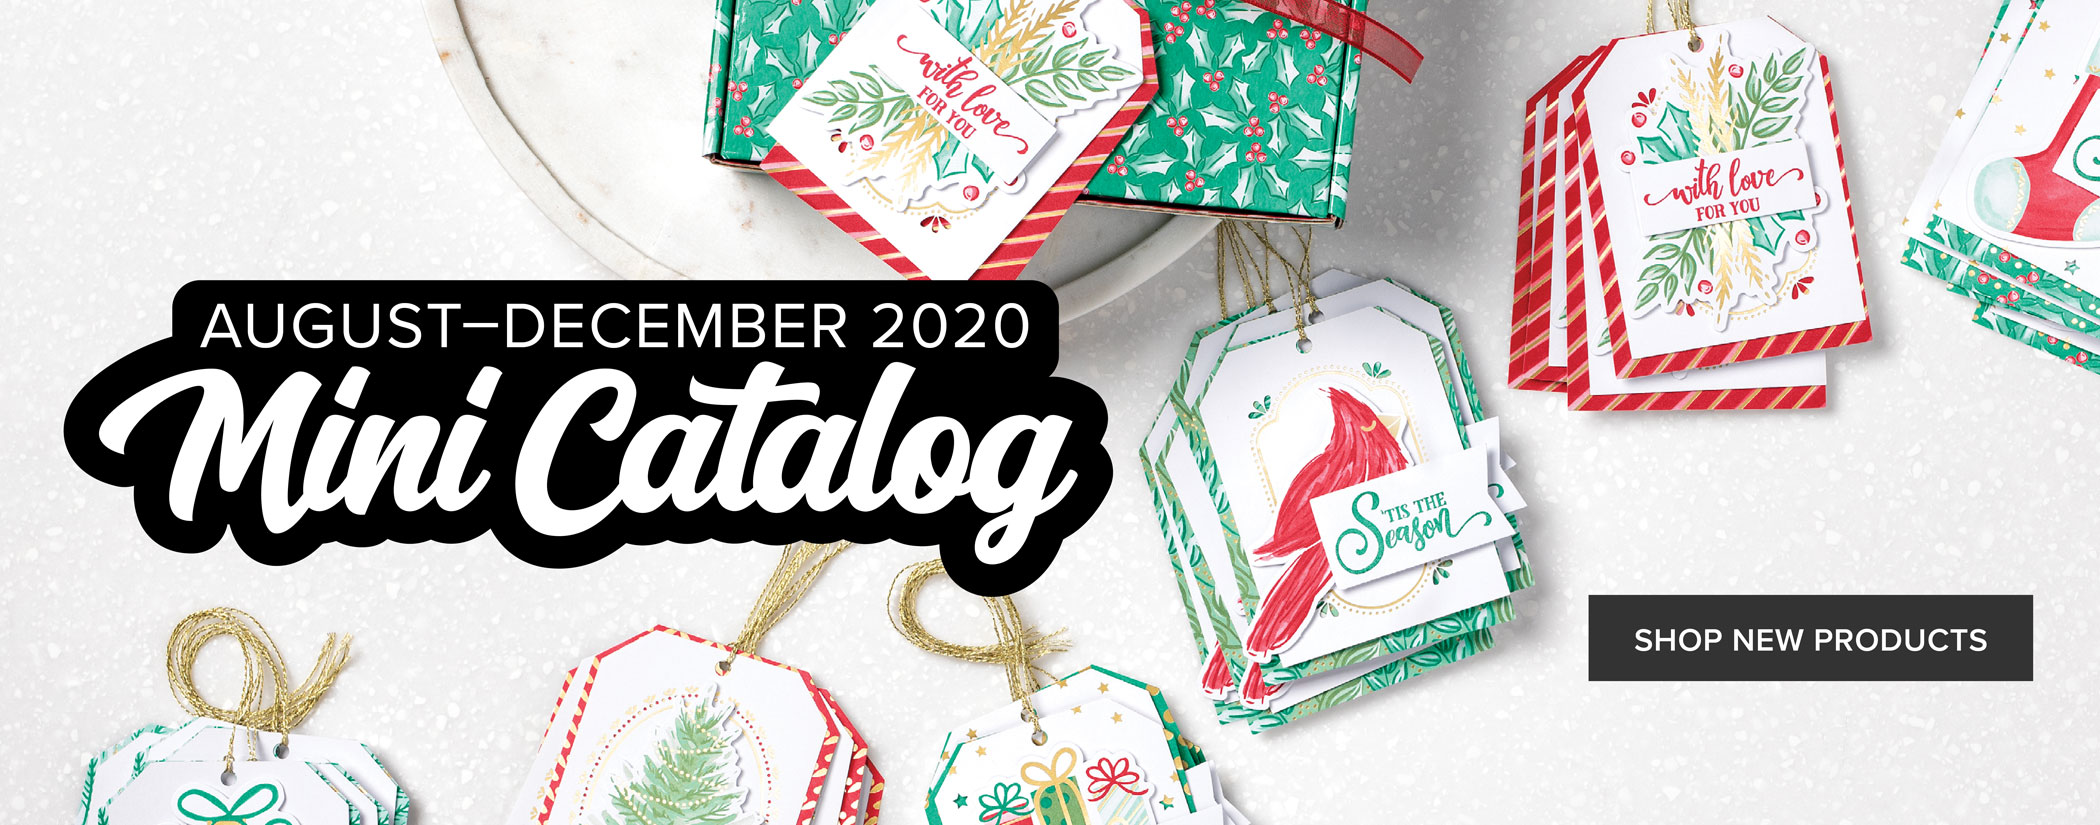 August-December 2020 Mini Catalog